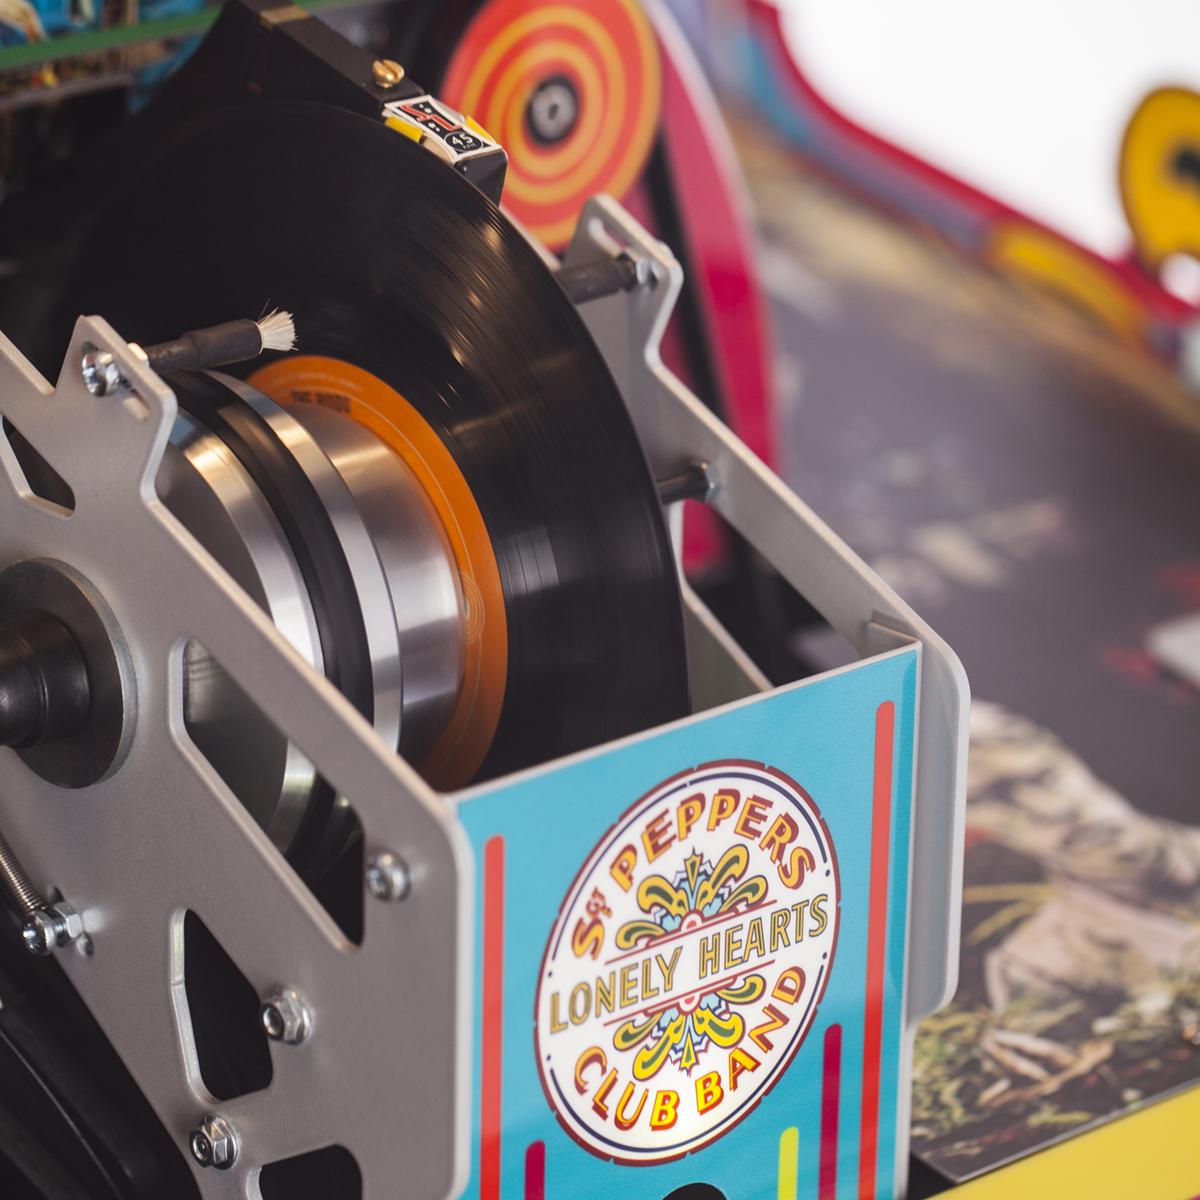 Sgt. Pepper Vinyl Rocket Jukebox